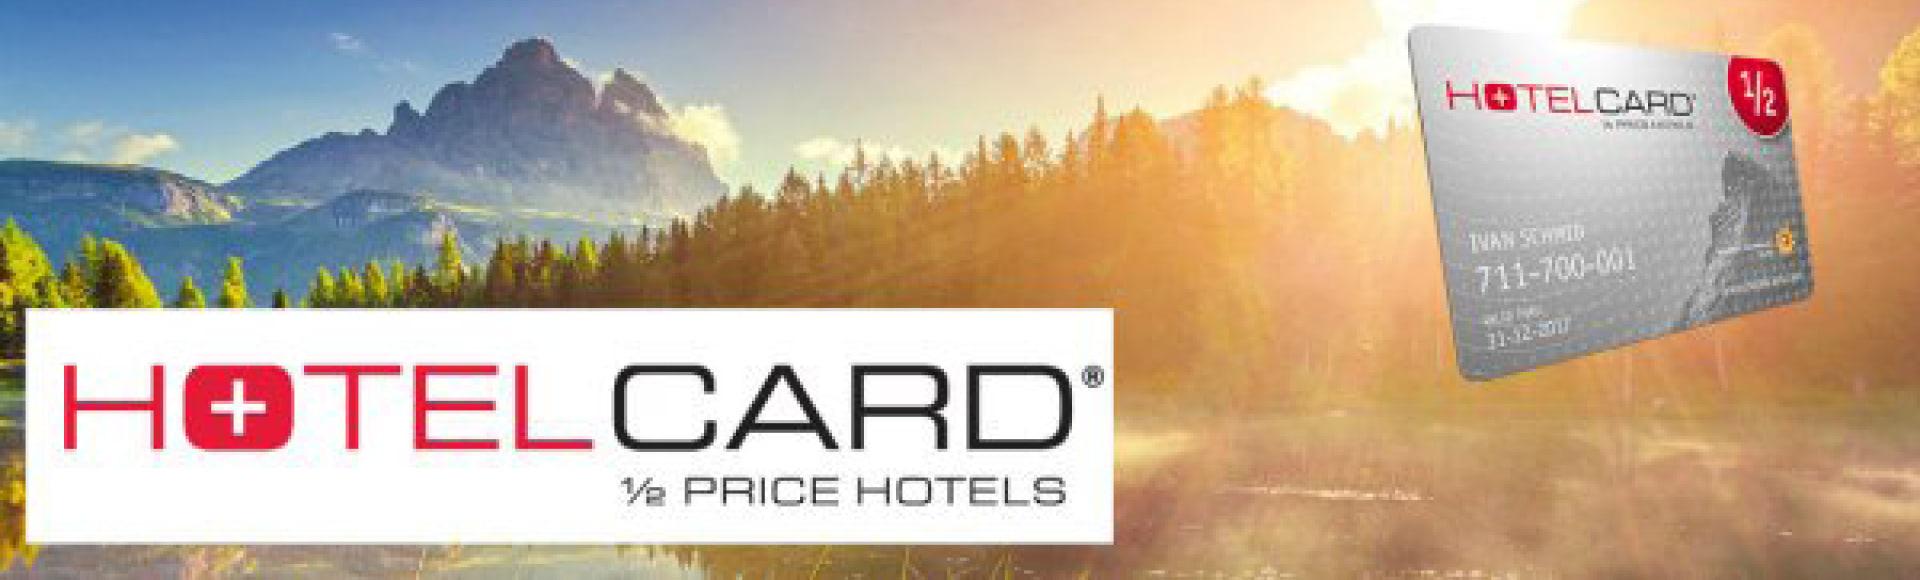 Hotelcard.ch